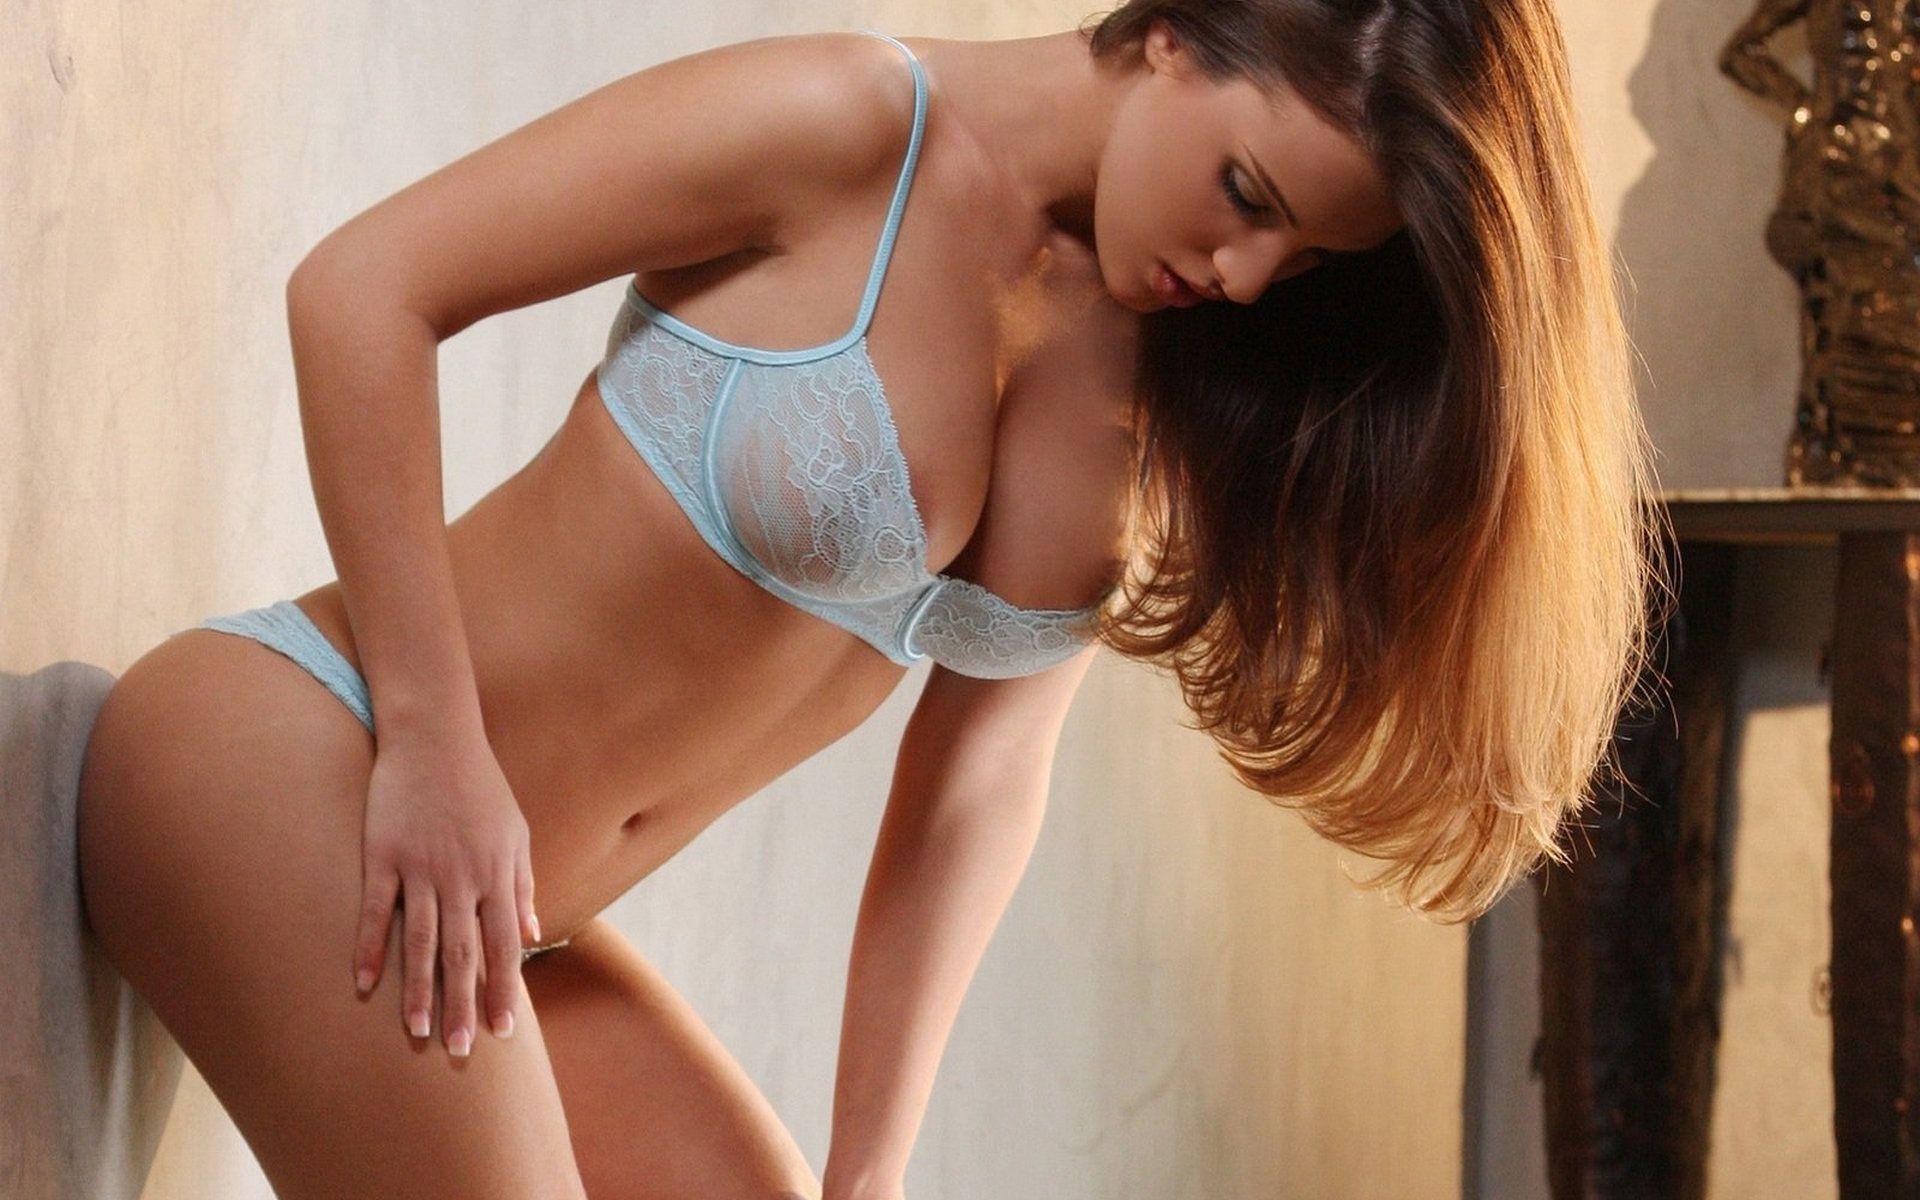 La lingerie, arma di seduzione di noi donne